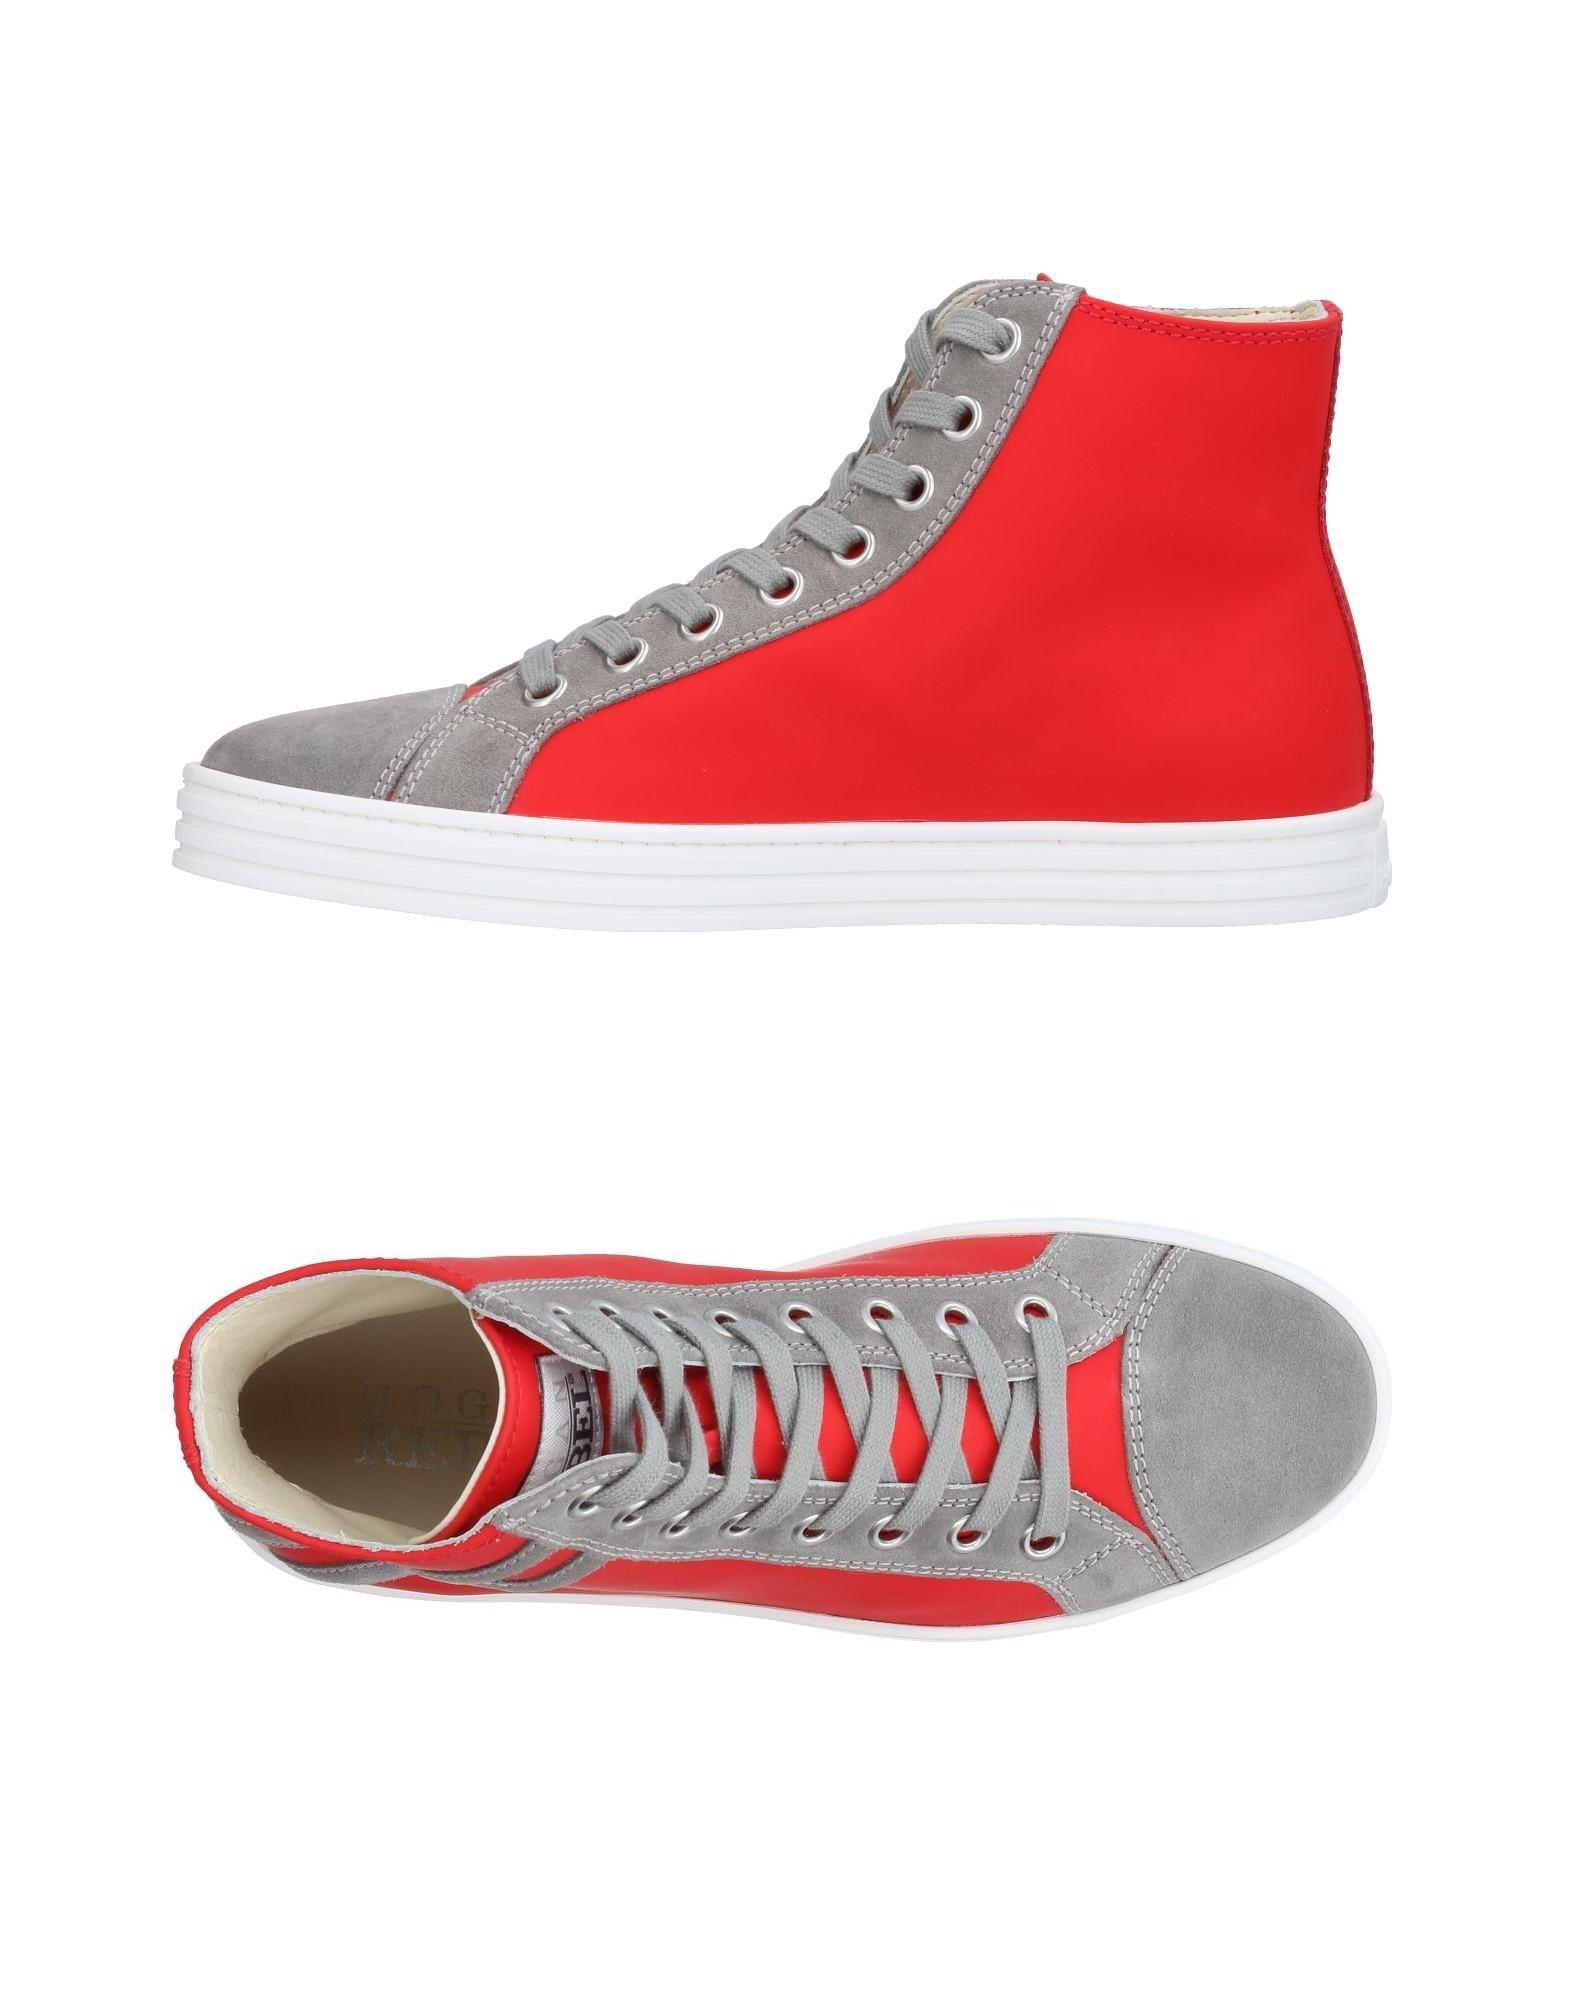 012d6dc918b Lyst - Hogan Rebel High-tops   Sneakers in Red for Men